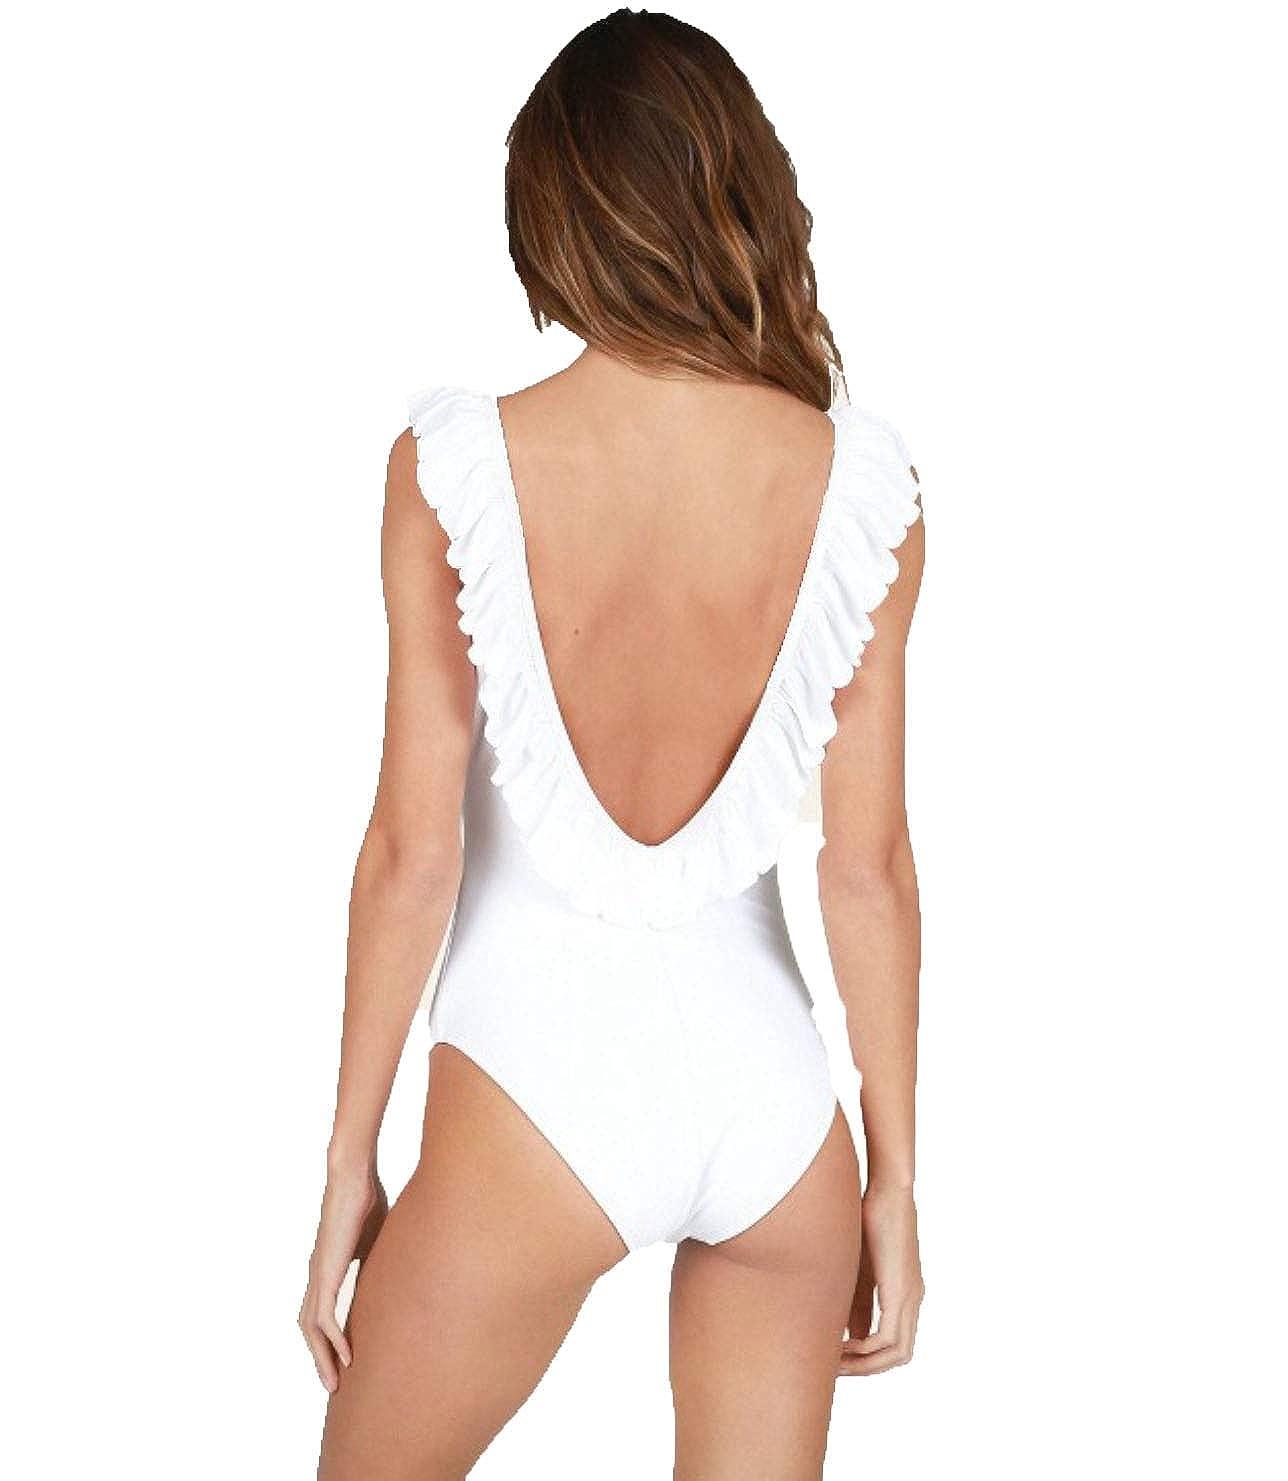 Lolli Sugar Coast Womens Ruffled One Piece Swimsuit White Large